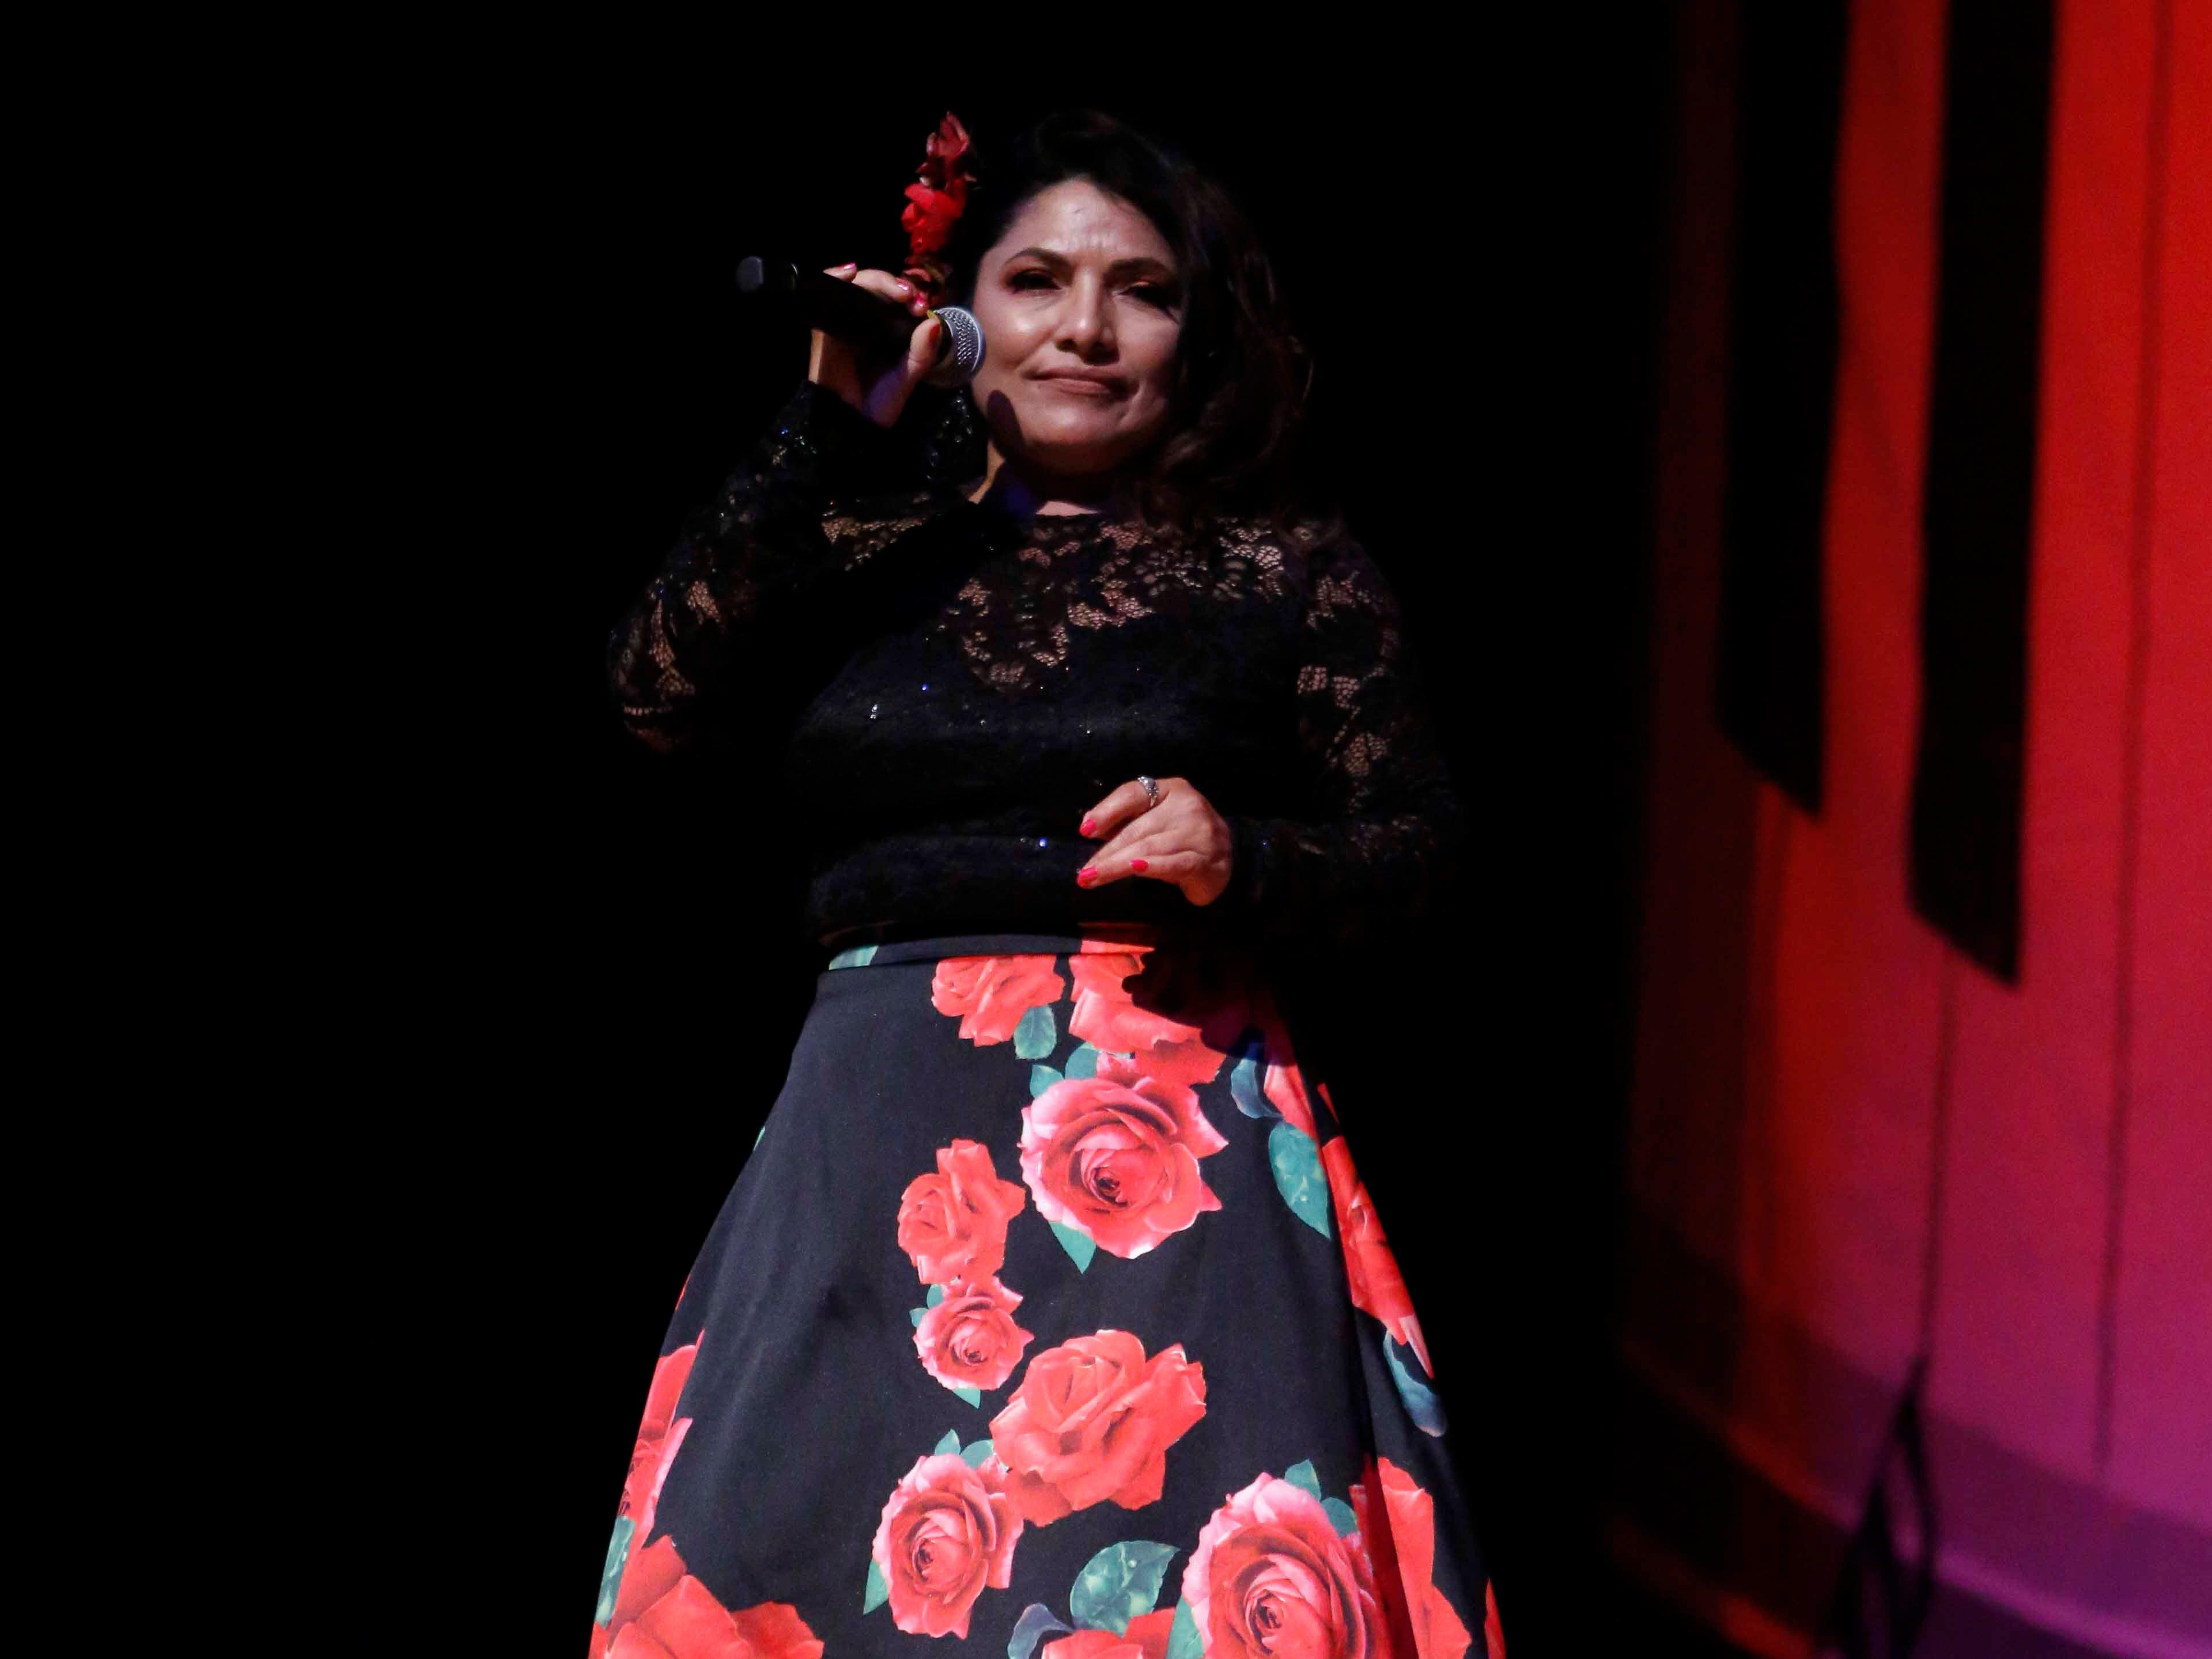 Alexa Garma sings during the 12th annual Noche Bohemia at Sherwood Hall on Saturday, April 27, 2019 in Salinas, Calif.